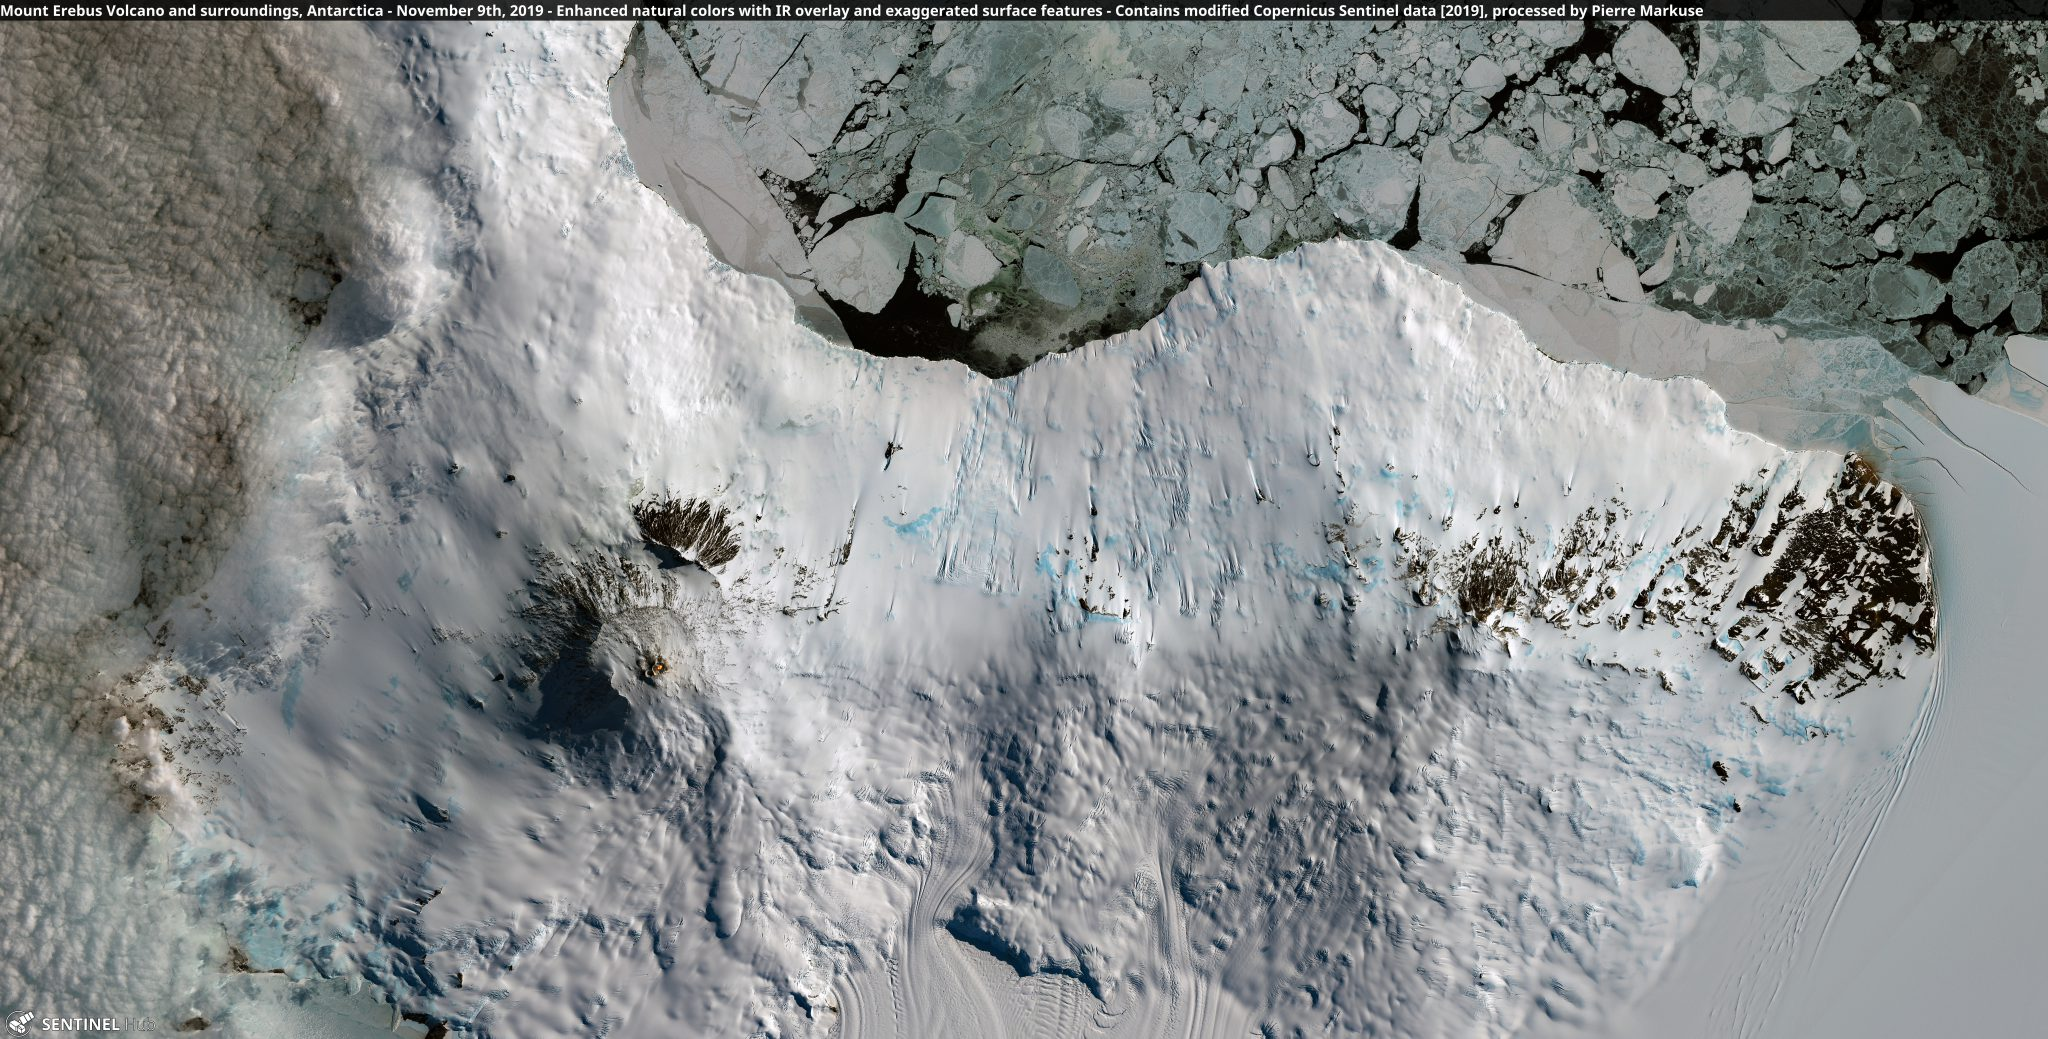 desc:Mount Erebus Volcano, Antarctica - November 9th, 2019 Copernicus/Pierre Markuse